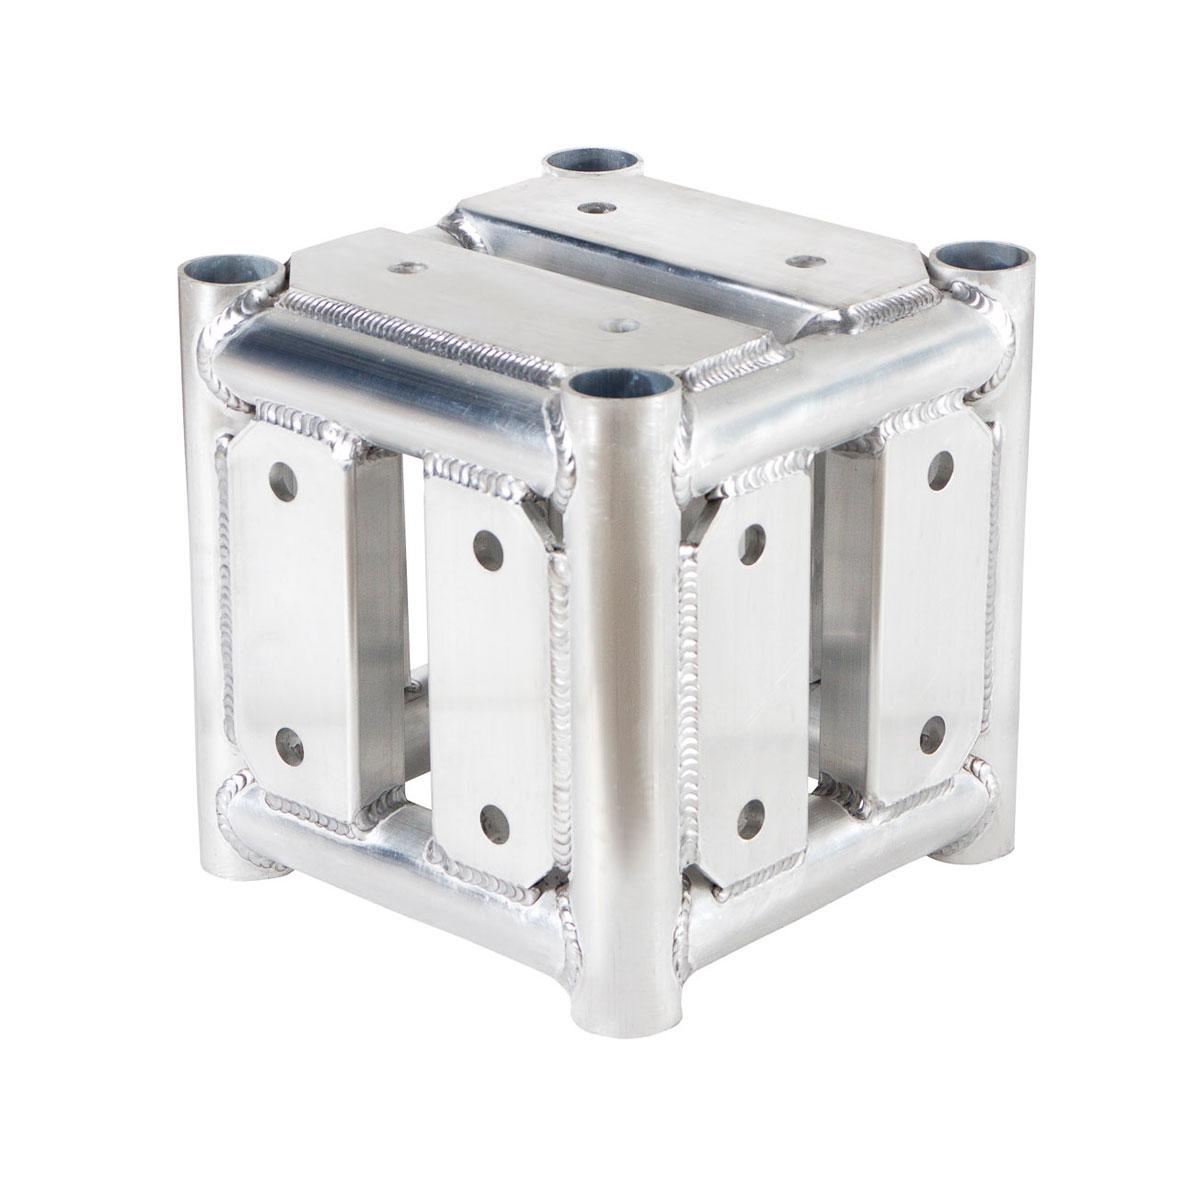 Cubo AL-P30 - 5 faces